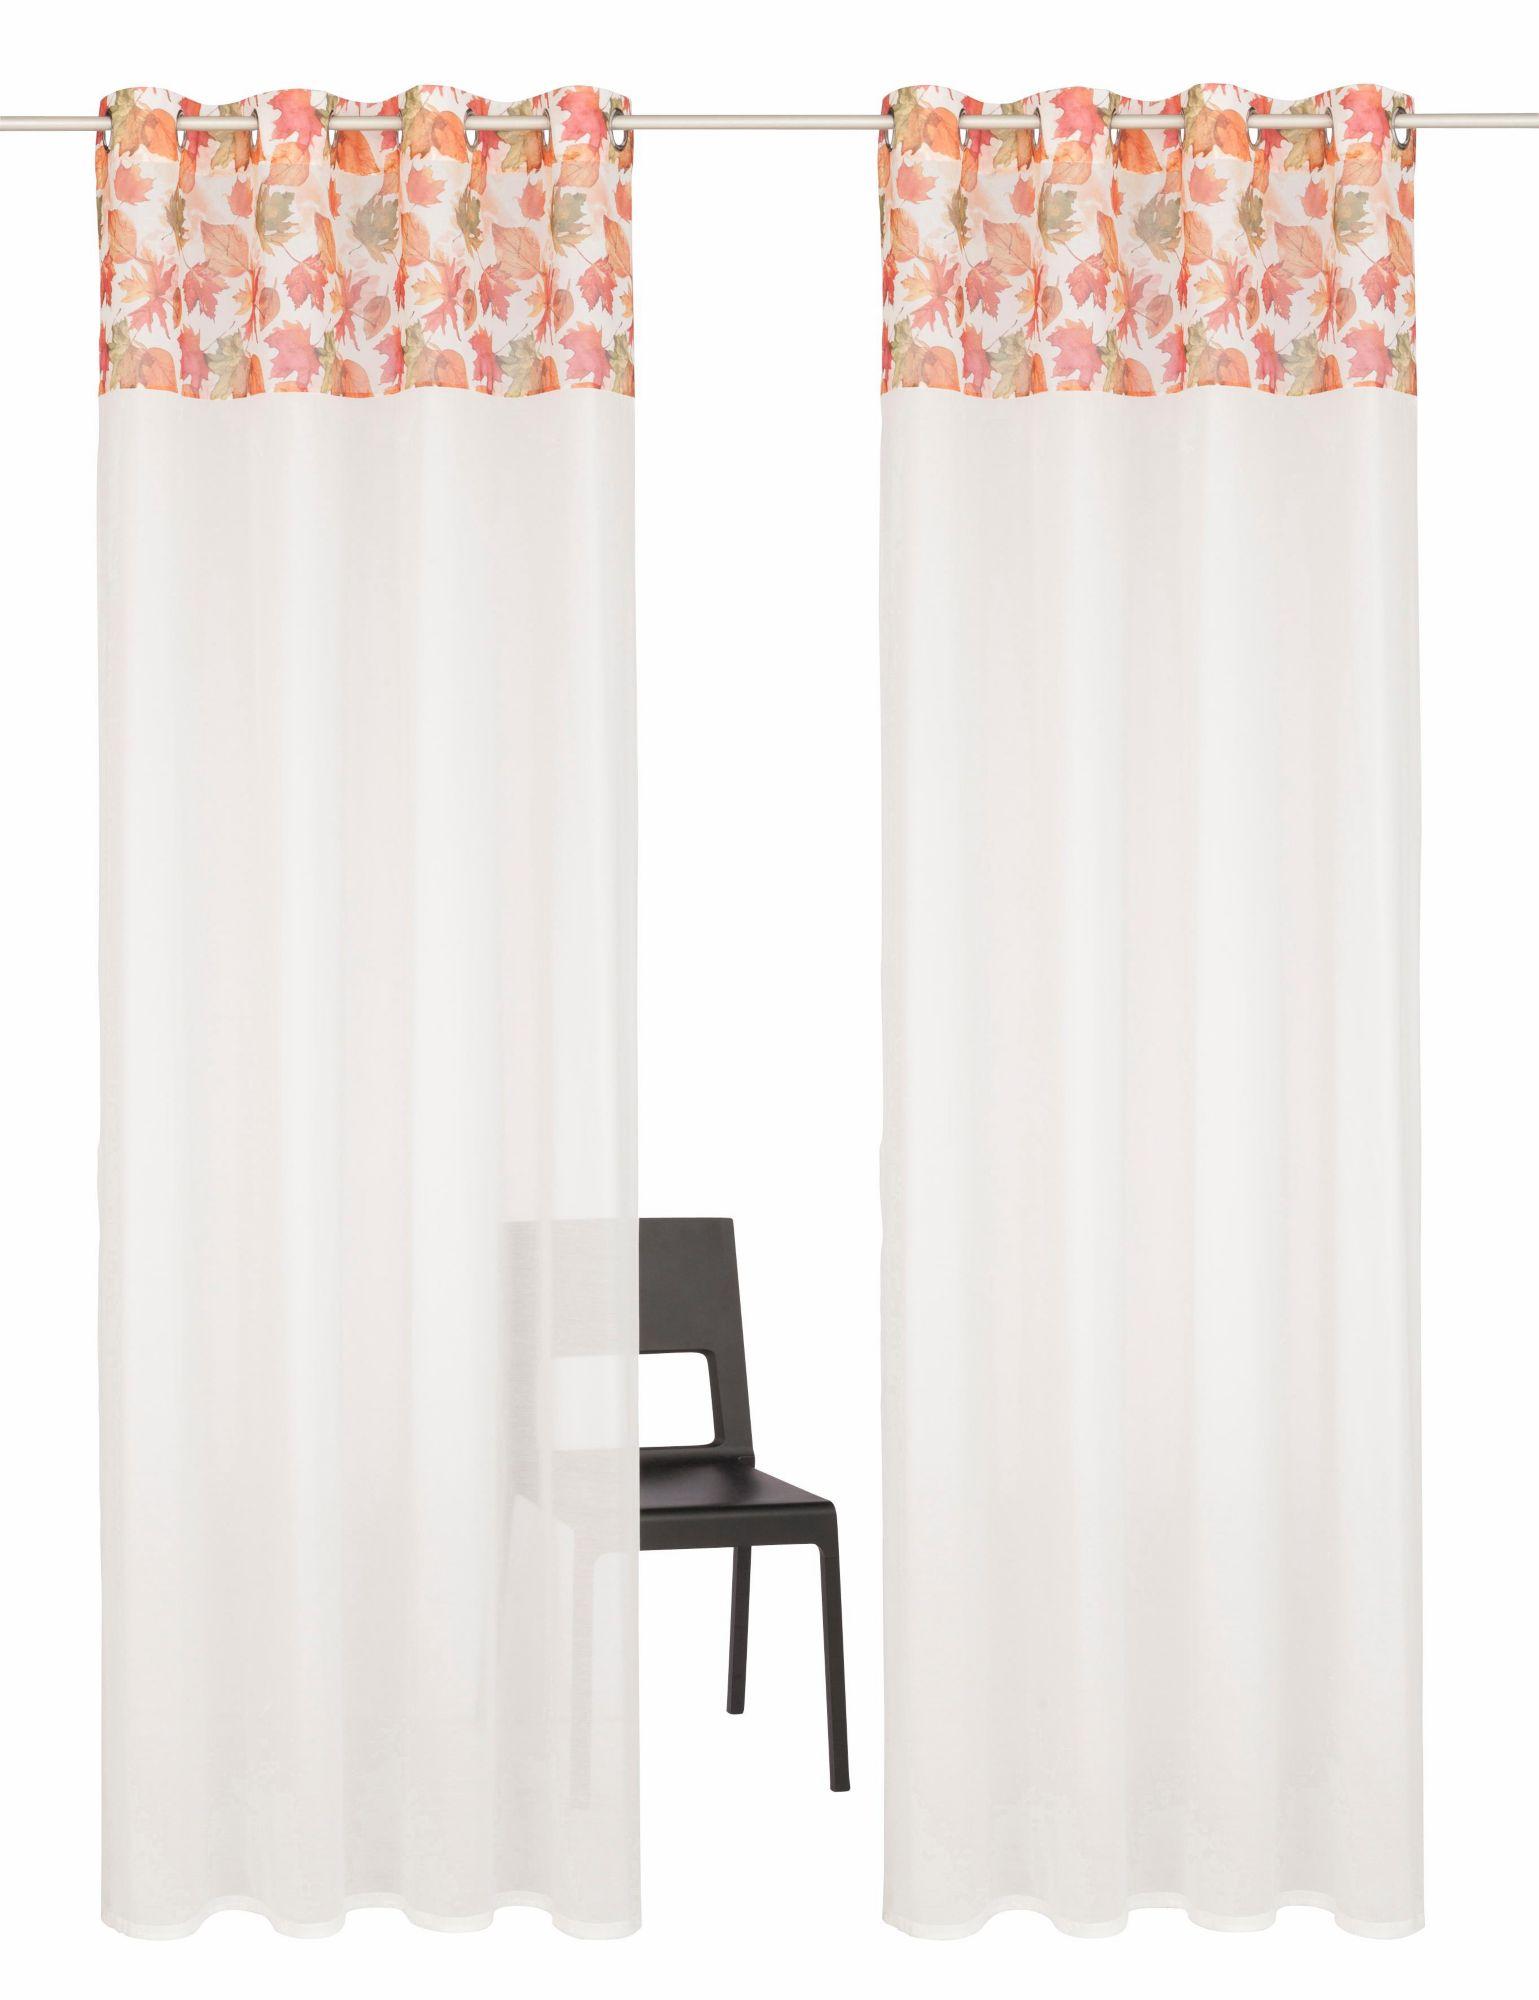 HOME AFFAIRE COLLECTION Gardine, Home affaire Collection, »Forest«, mit Ösen (2 Stück)